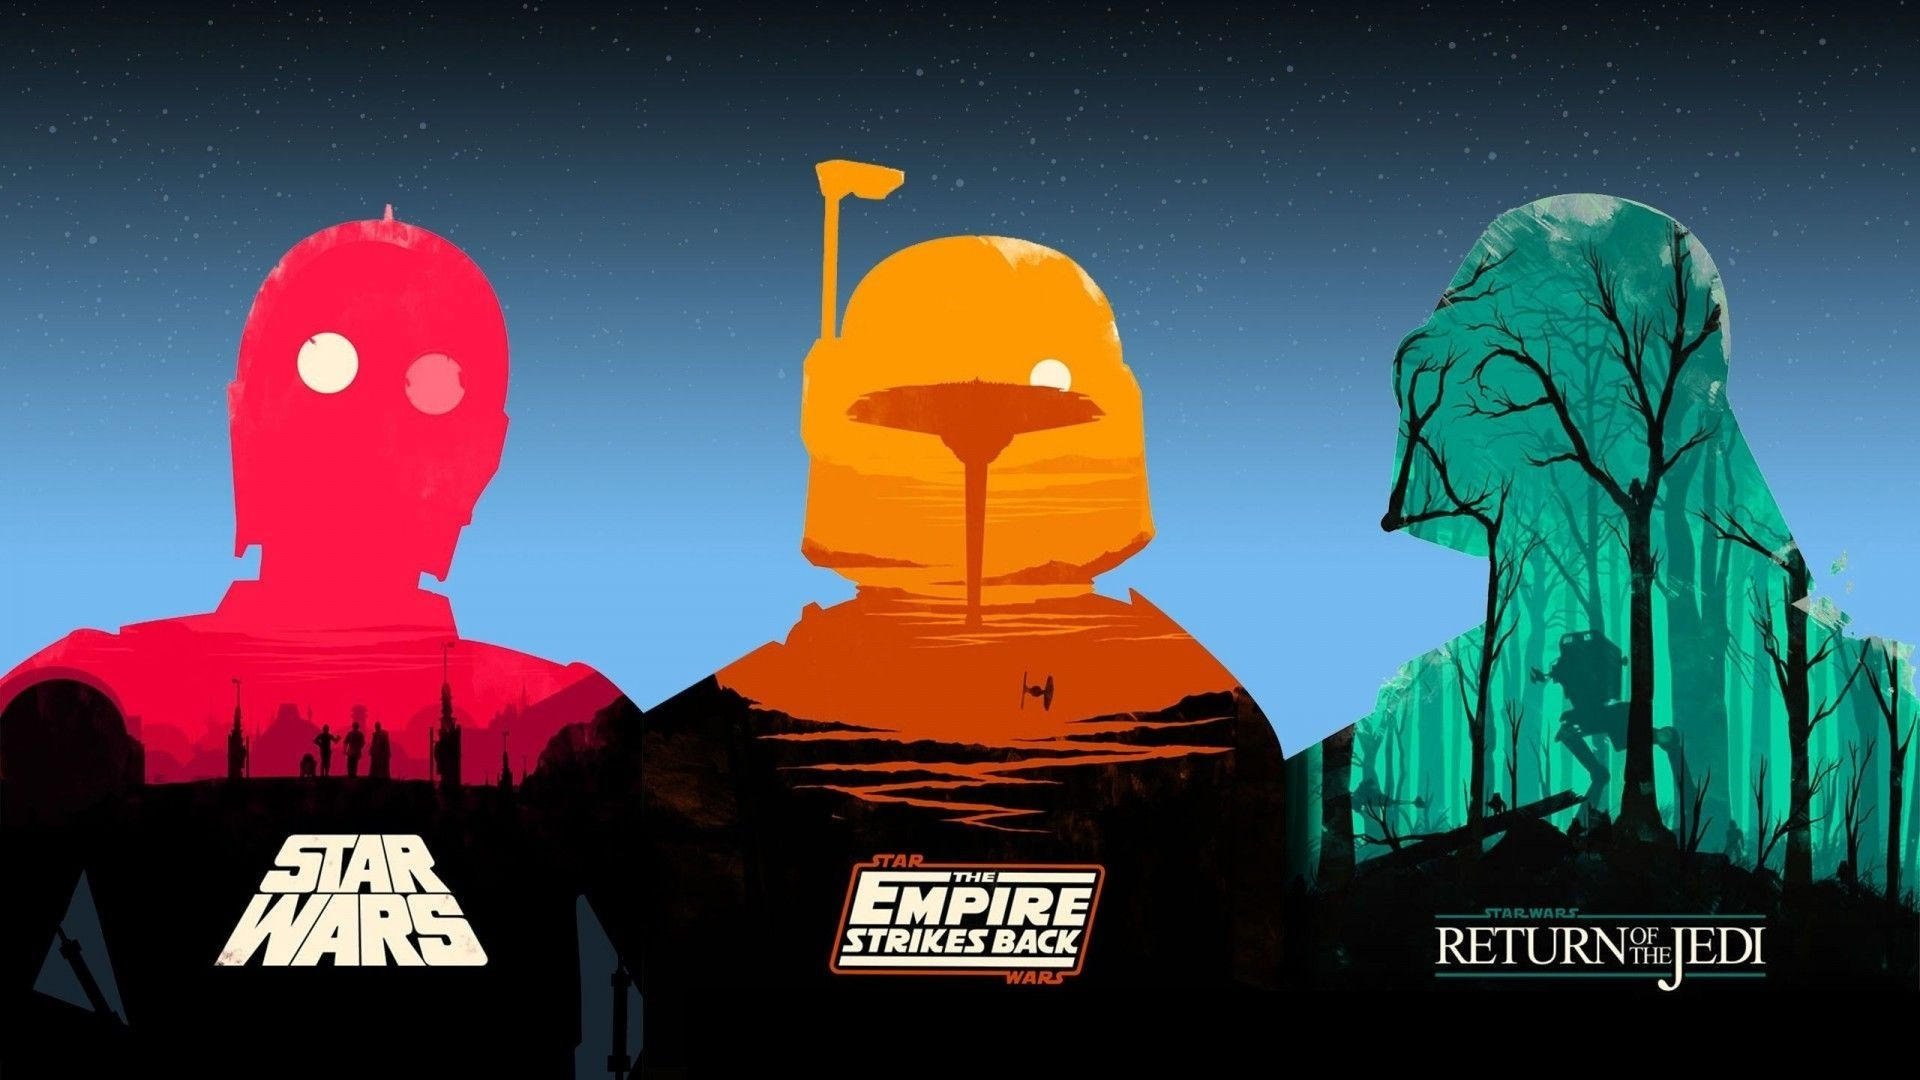 Cool Star Wars Wallpaper iwLd7E5 …